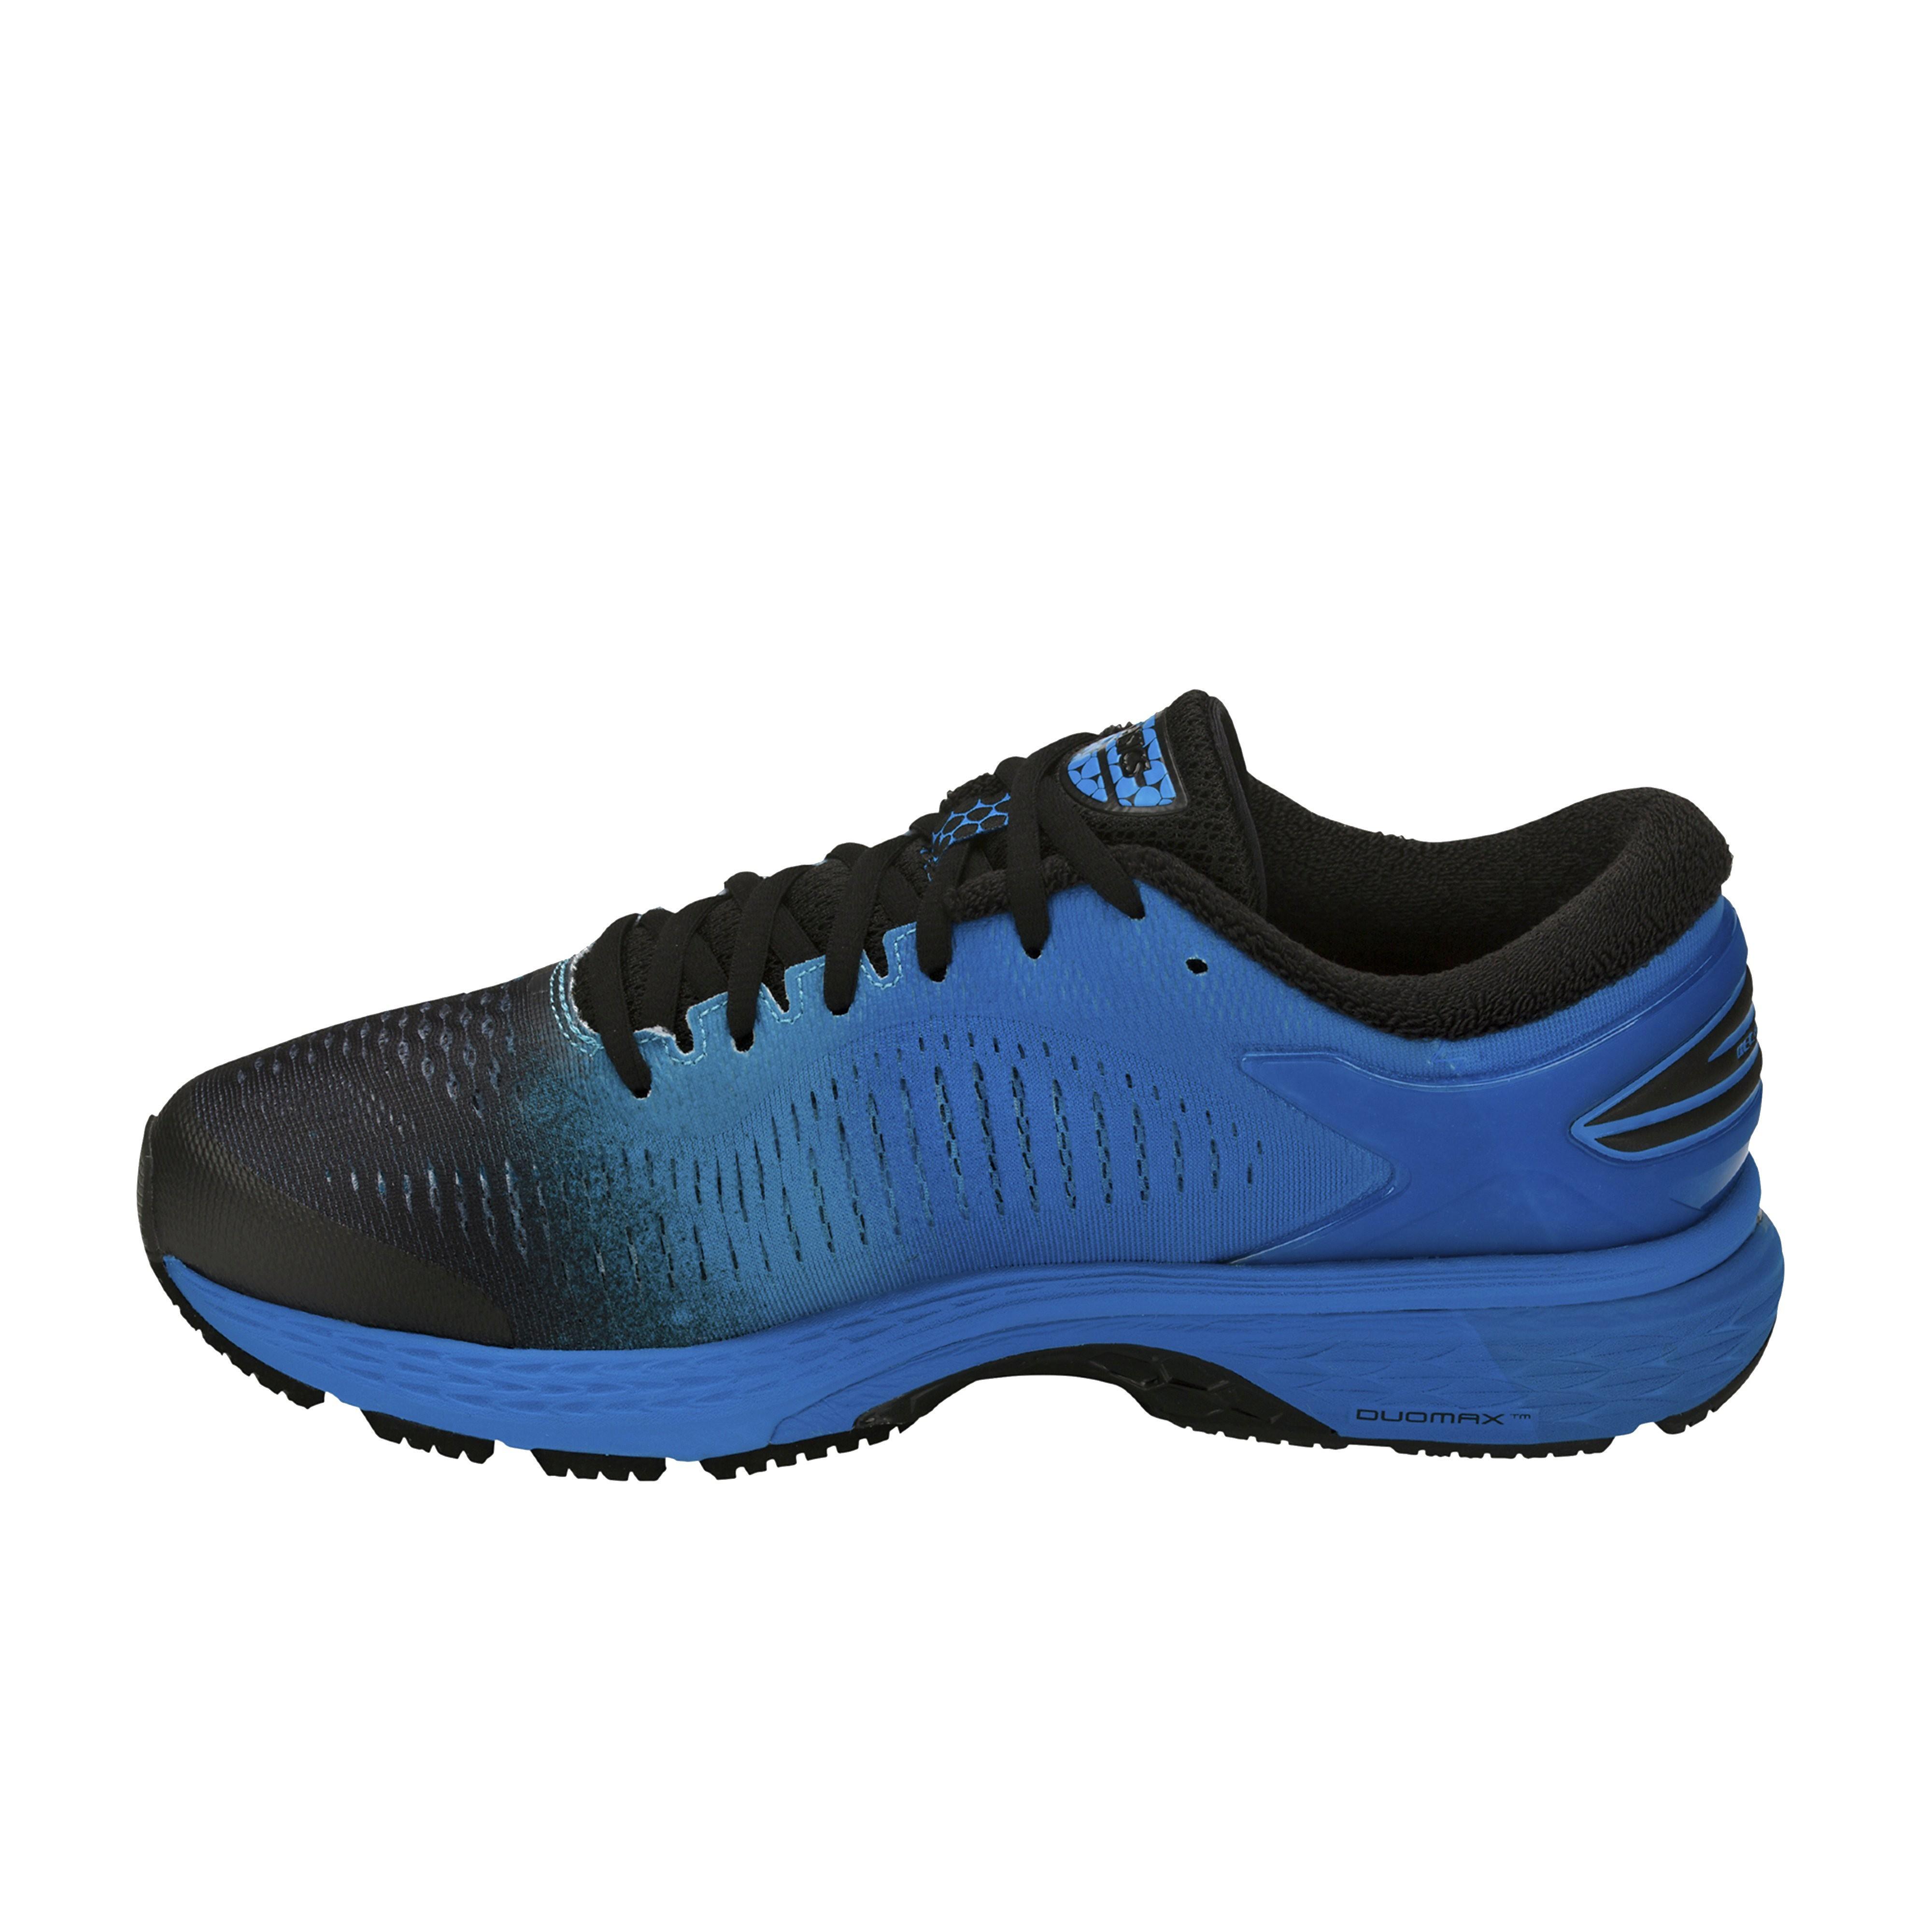 Mens Blue ASICS Gel-Kayano 25 SP Running Shoes